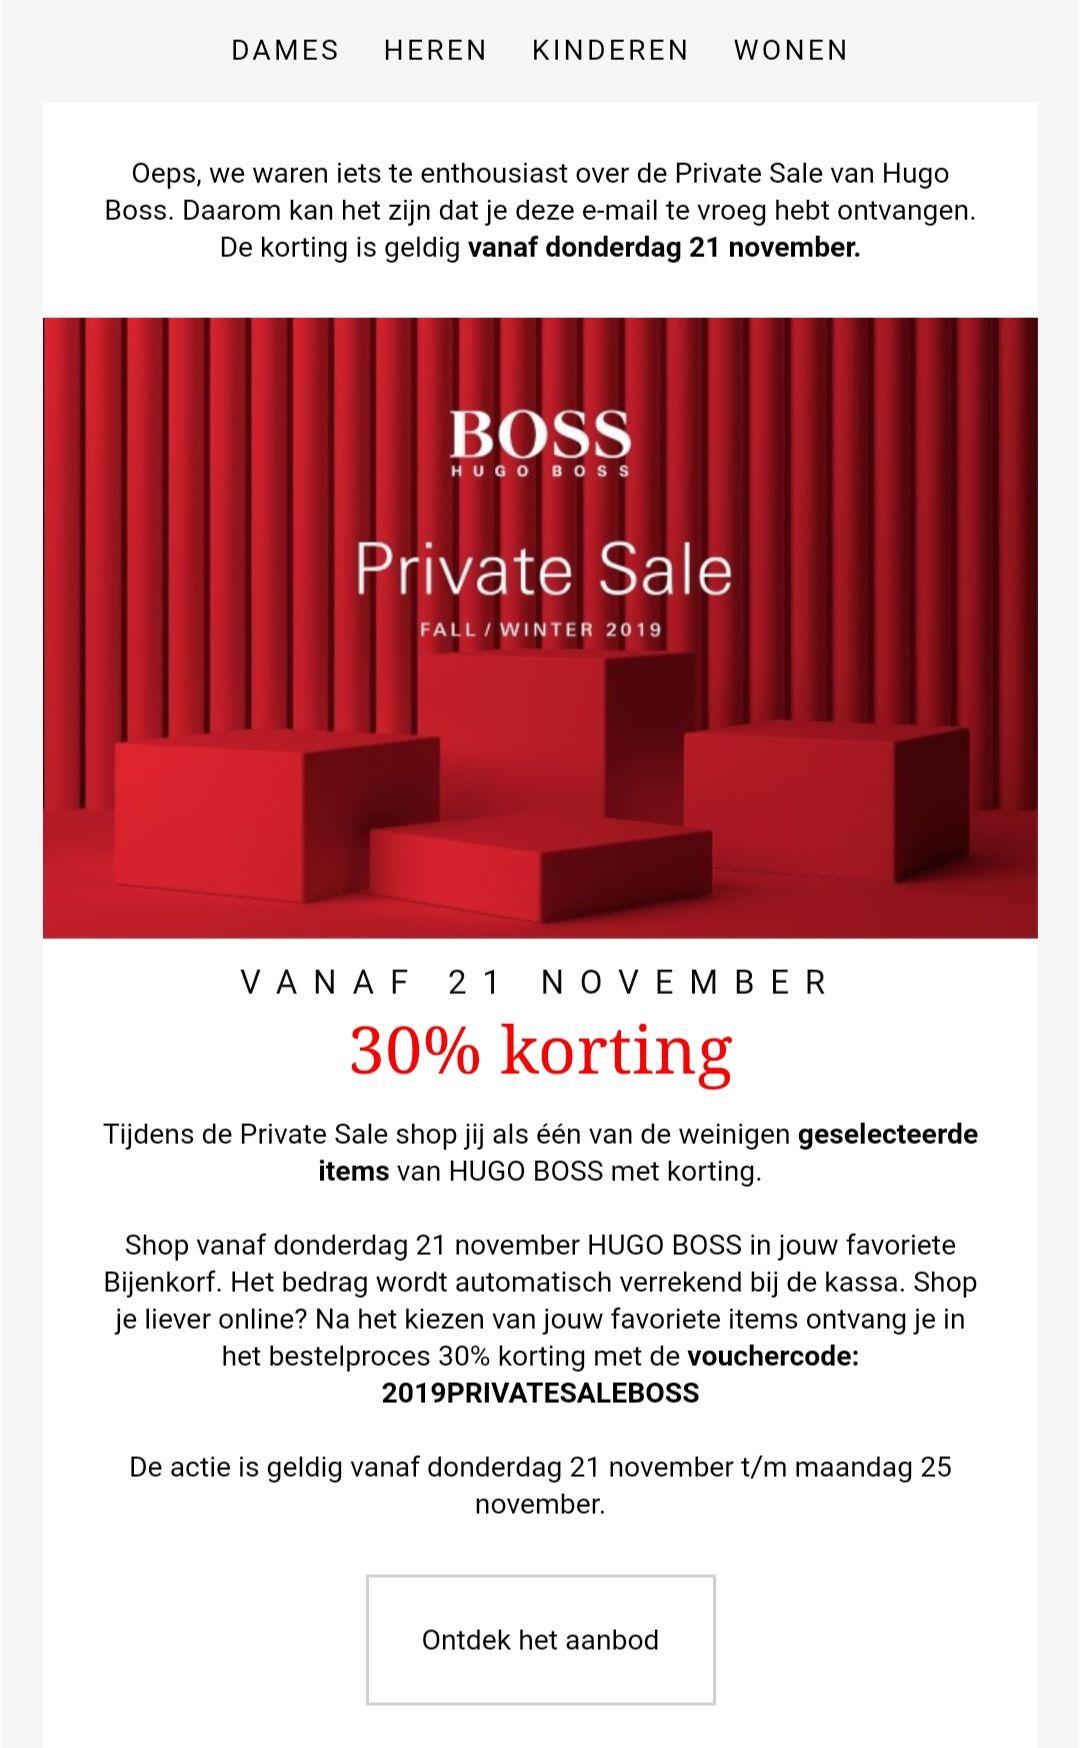 30% korting op private sale van Hugo Boss @ Bijenkorf